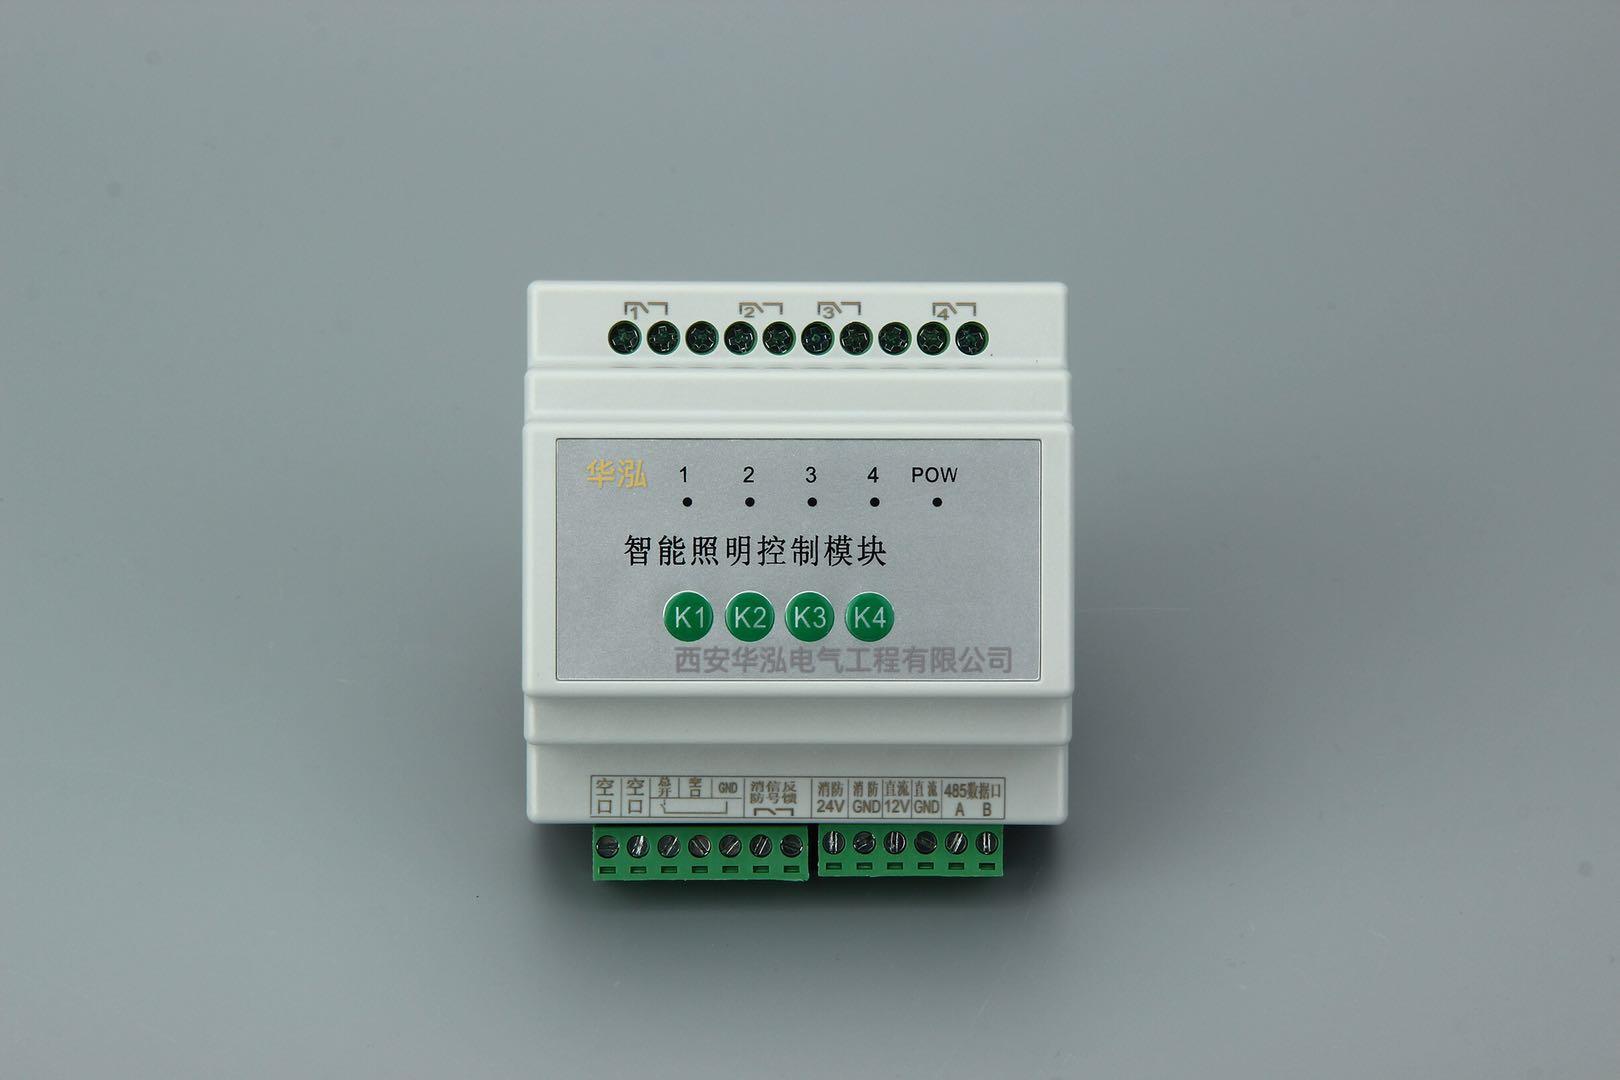 TYA608ABCD智能照明模块——质量好的产品